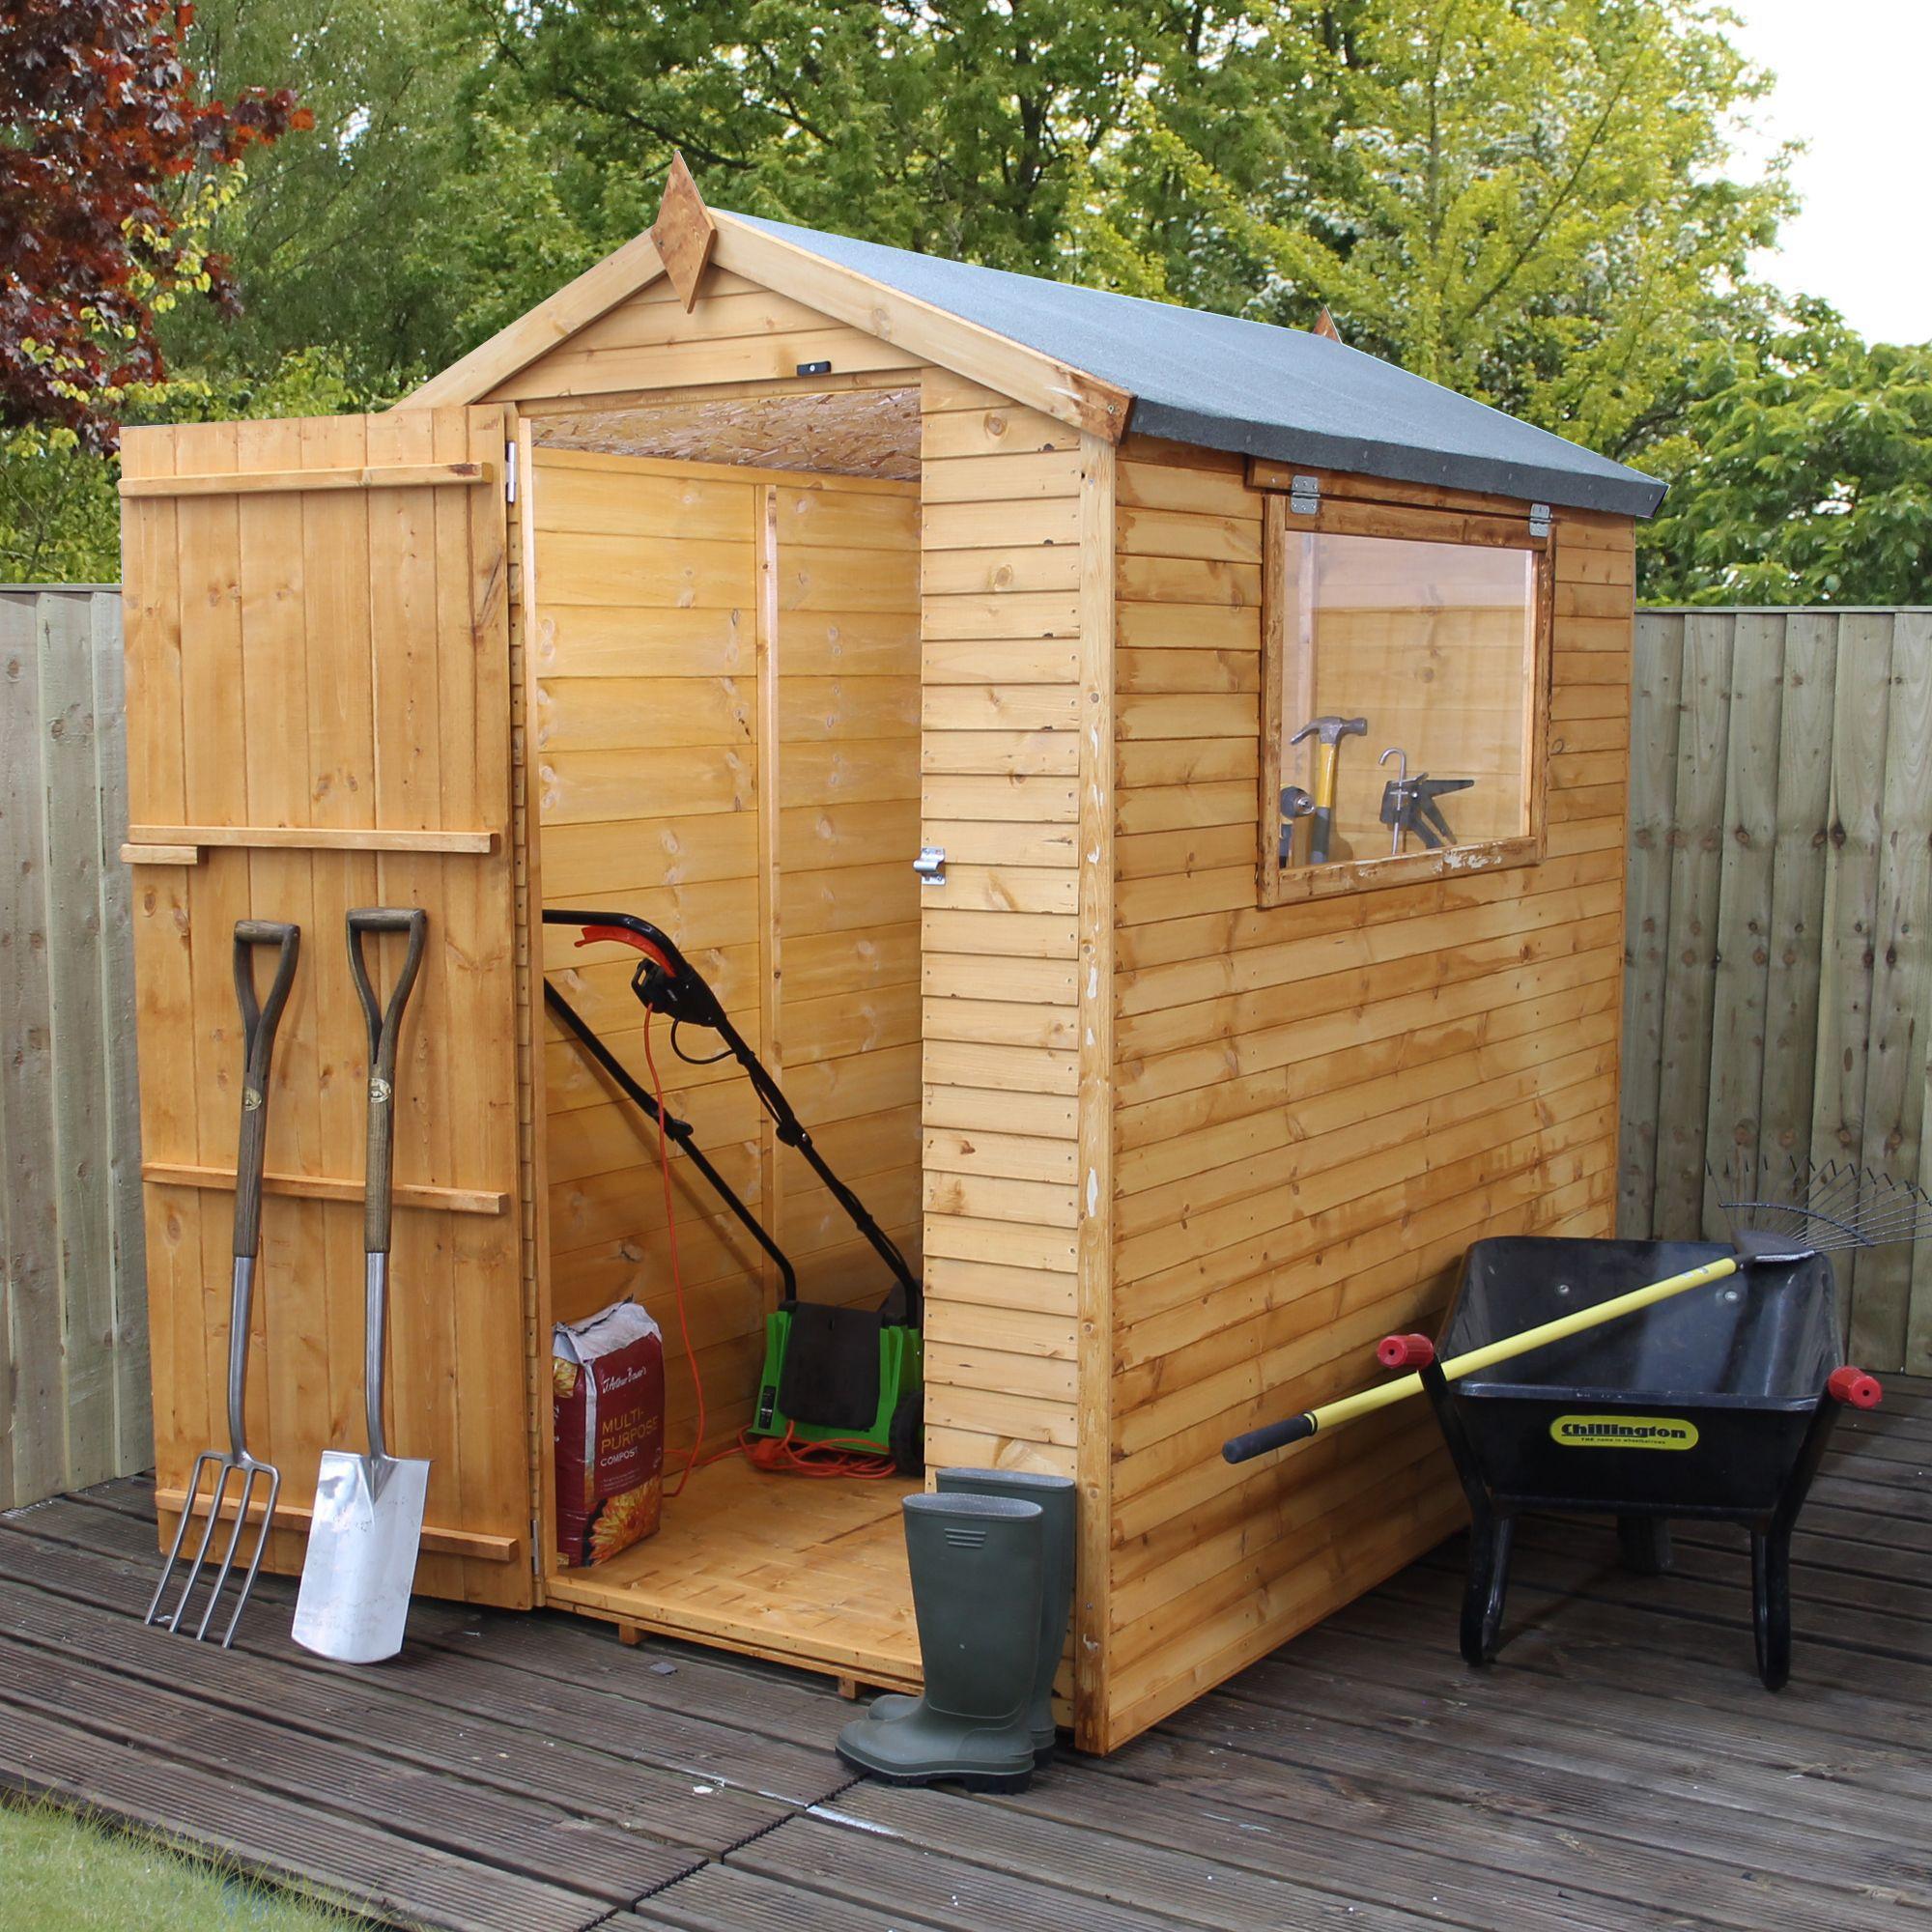 sheds cabins  u0026amp  summerhouses outdoor  u0026 garden   diy at b u0026q  rh   diy